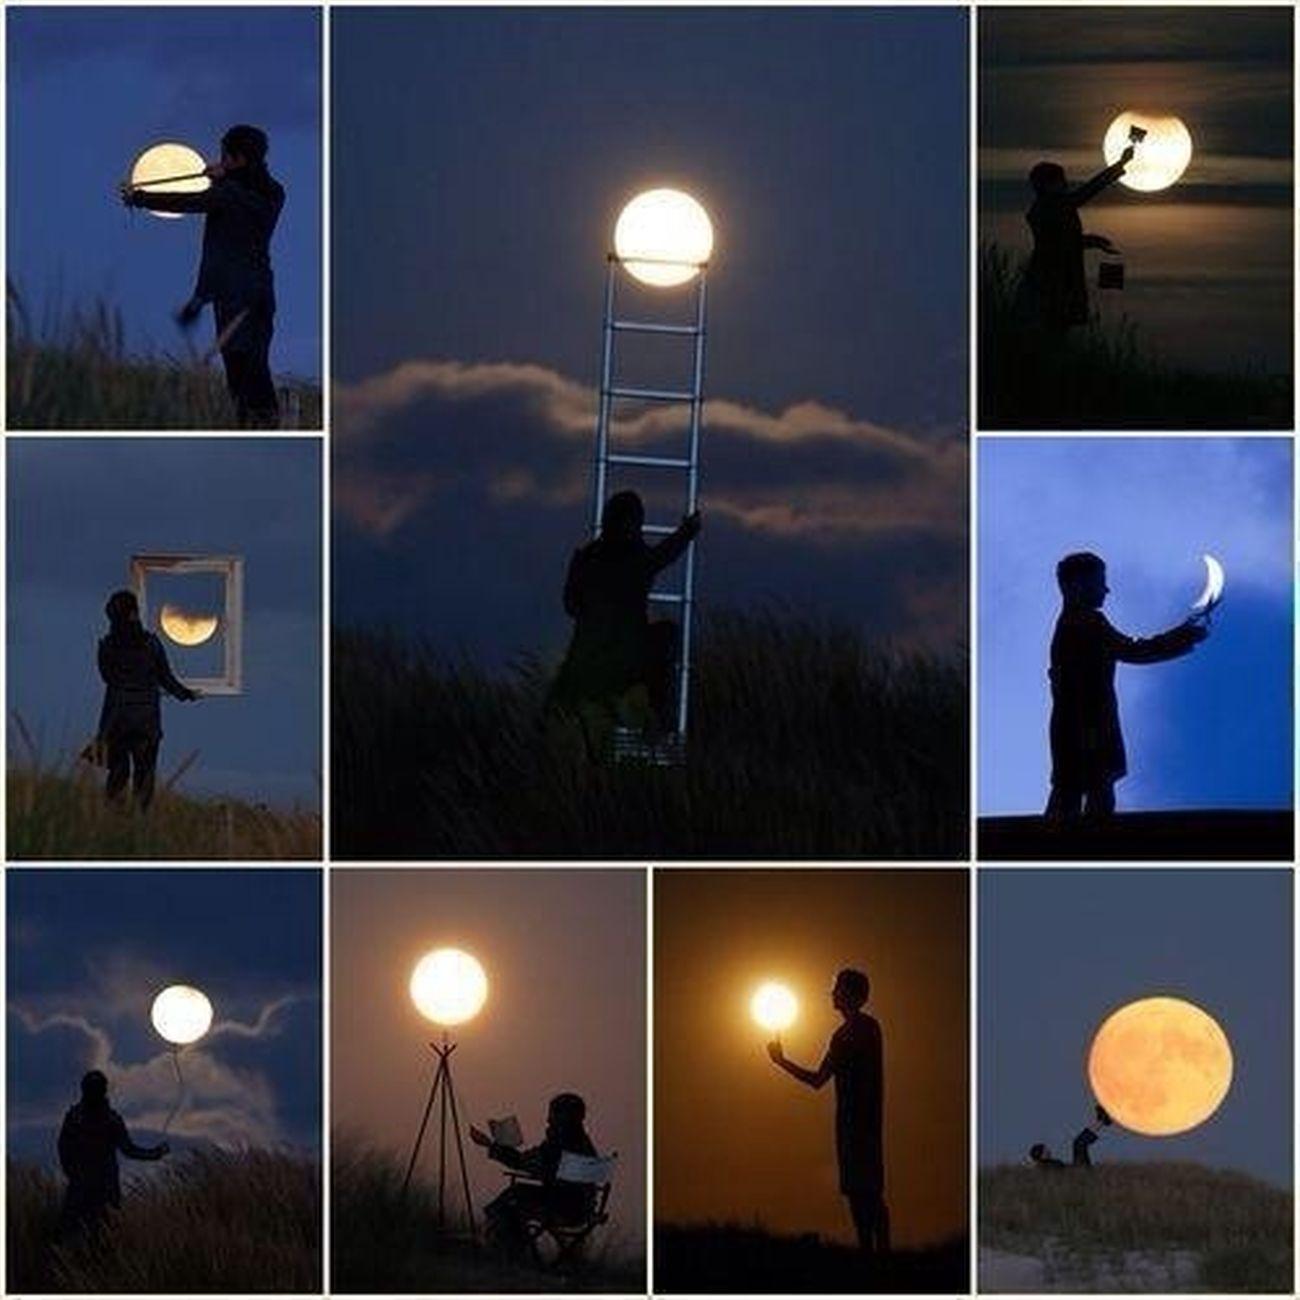 Amazing picture